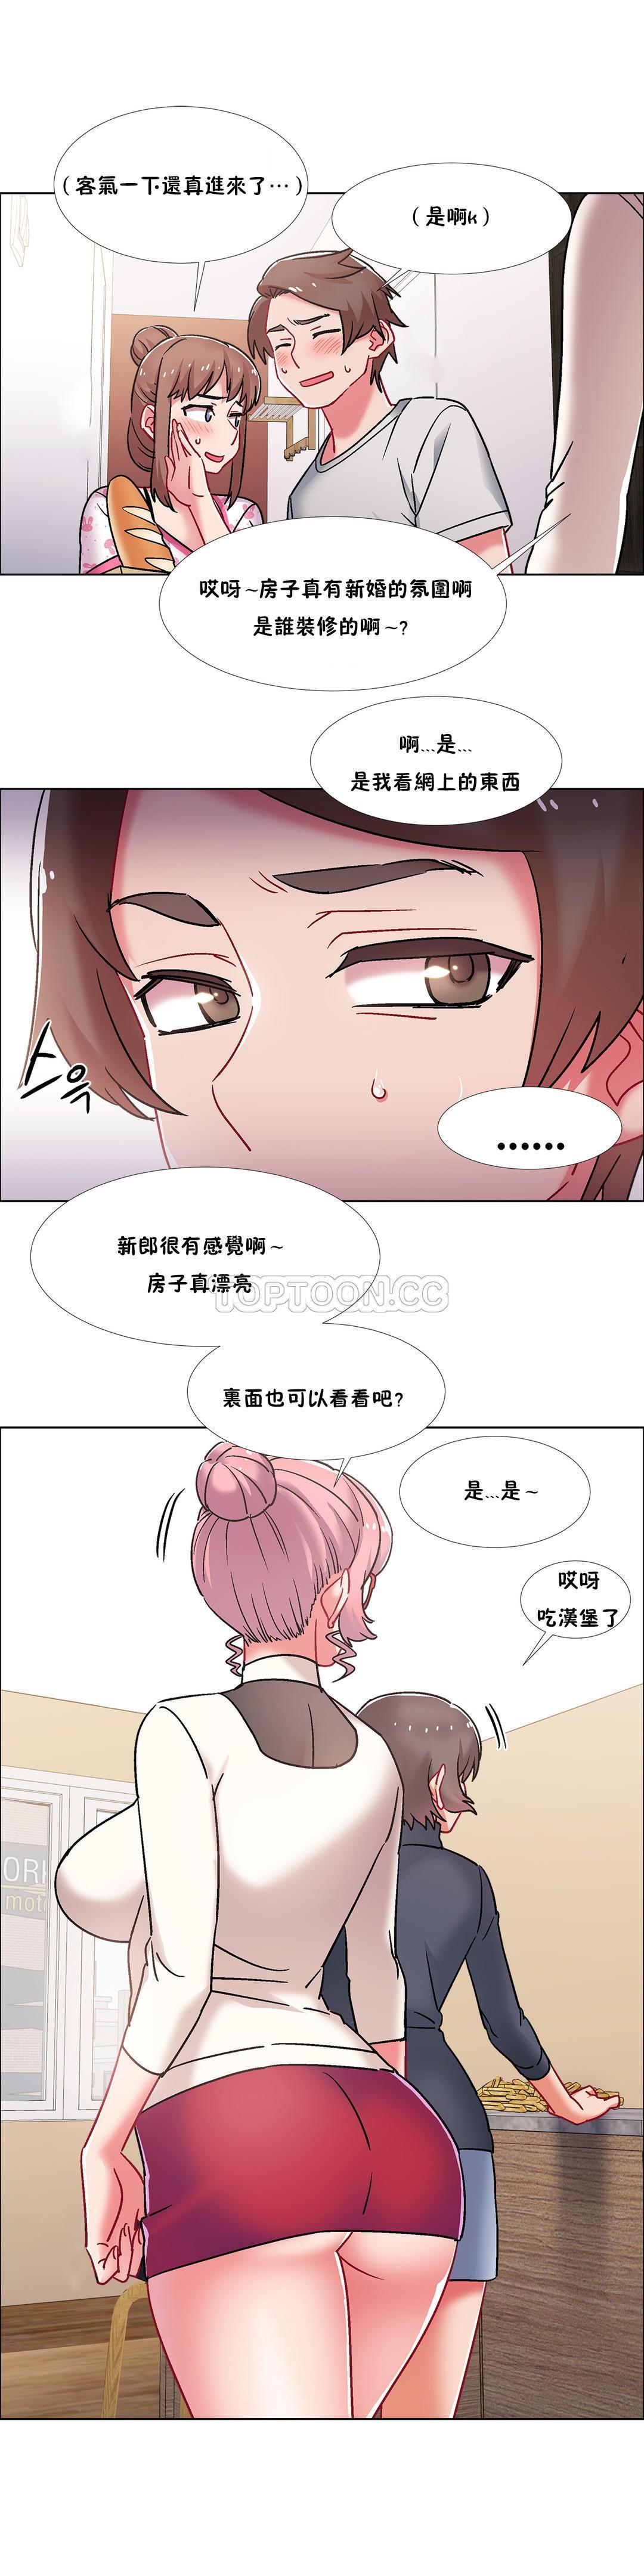 [Studio Wannabe] Rental Girls | 出租女郎 Ch. 33-58 [Chinese]  第二季 完结 249